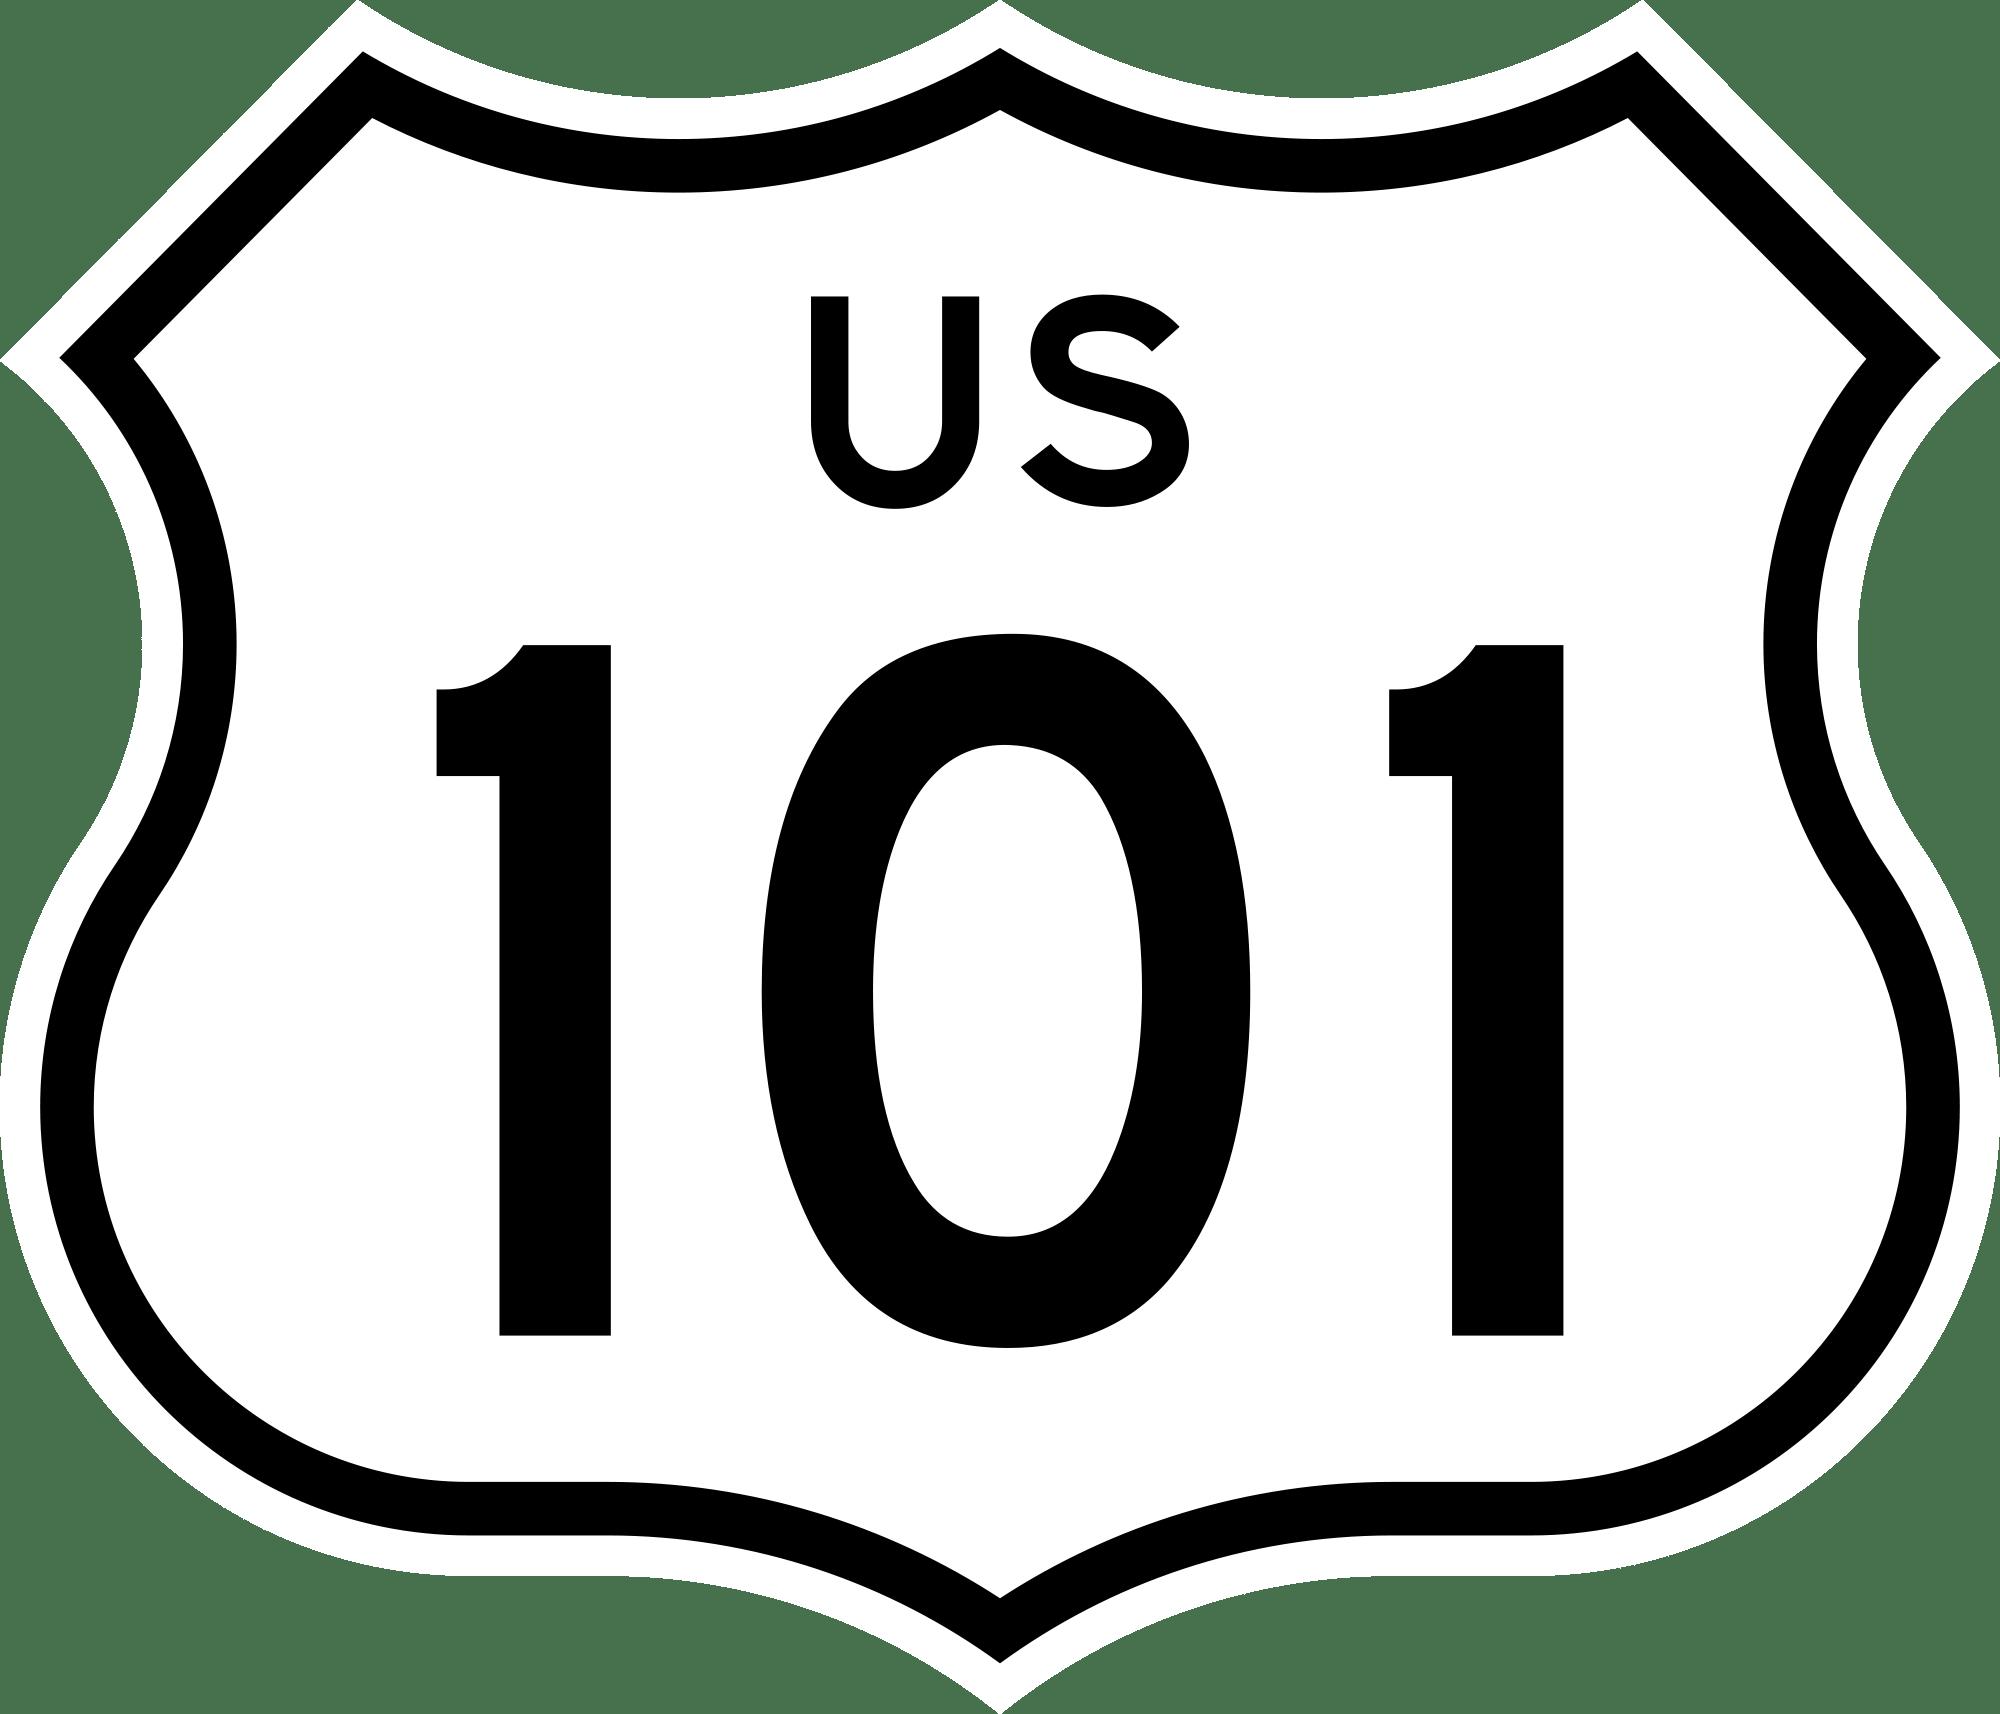 U S Route 101 Clipart